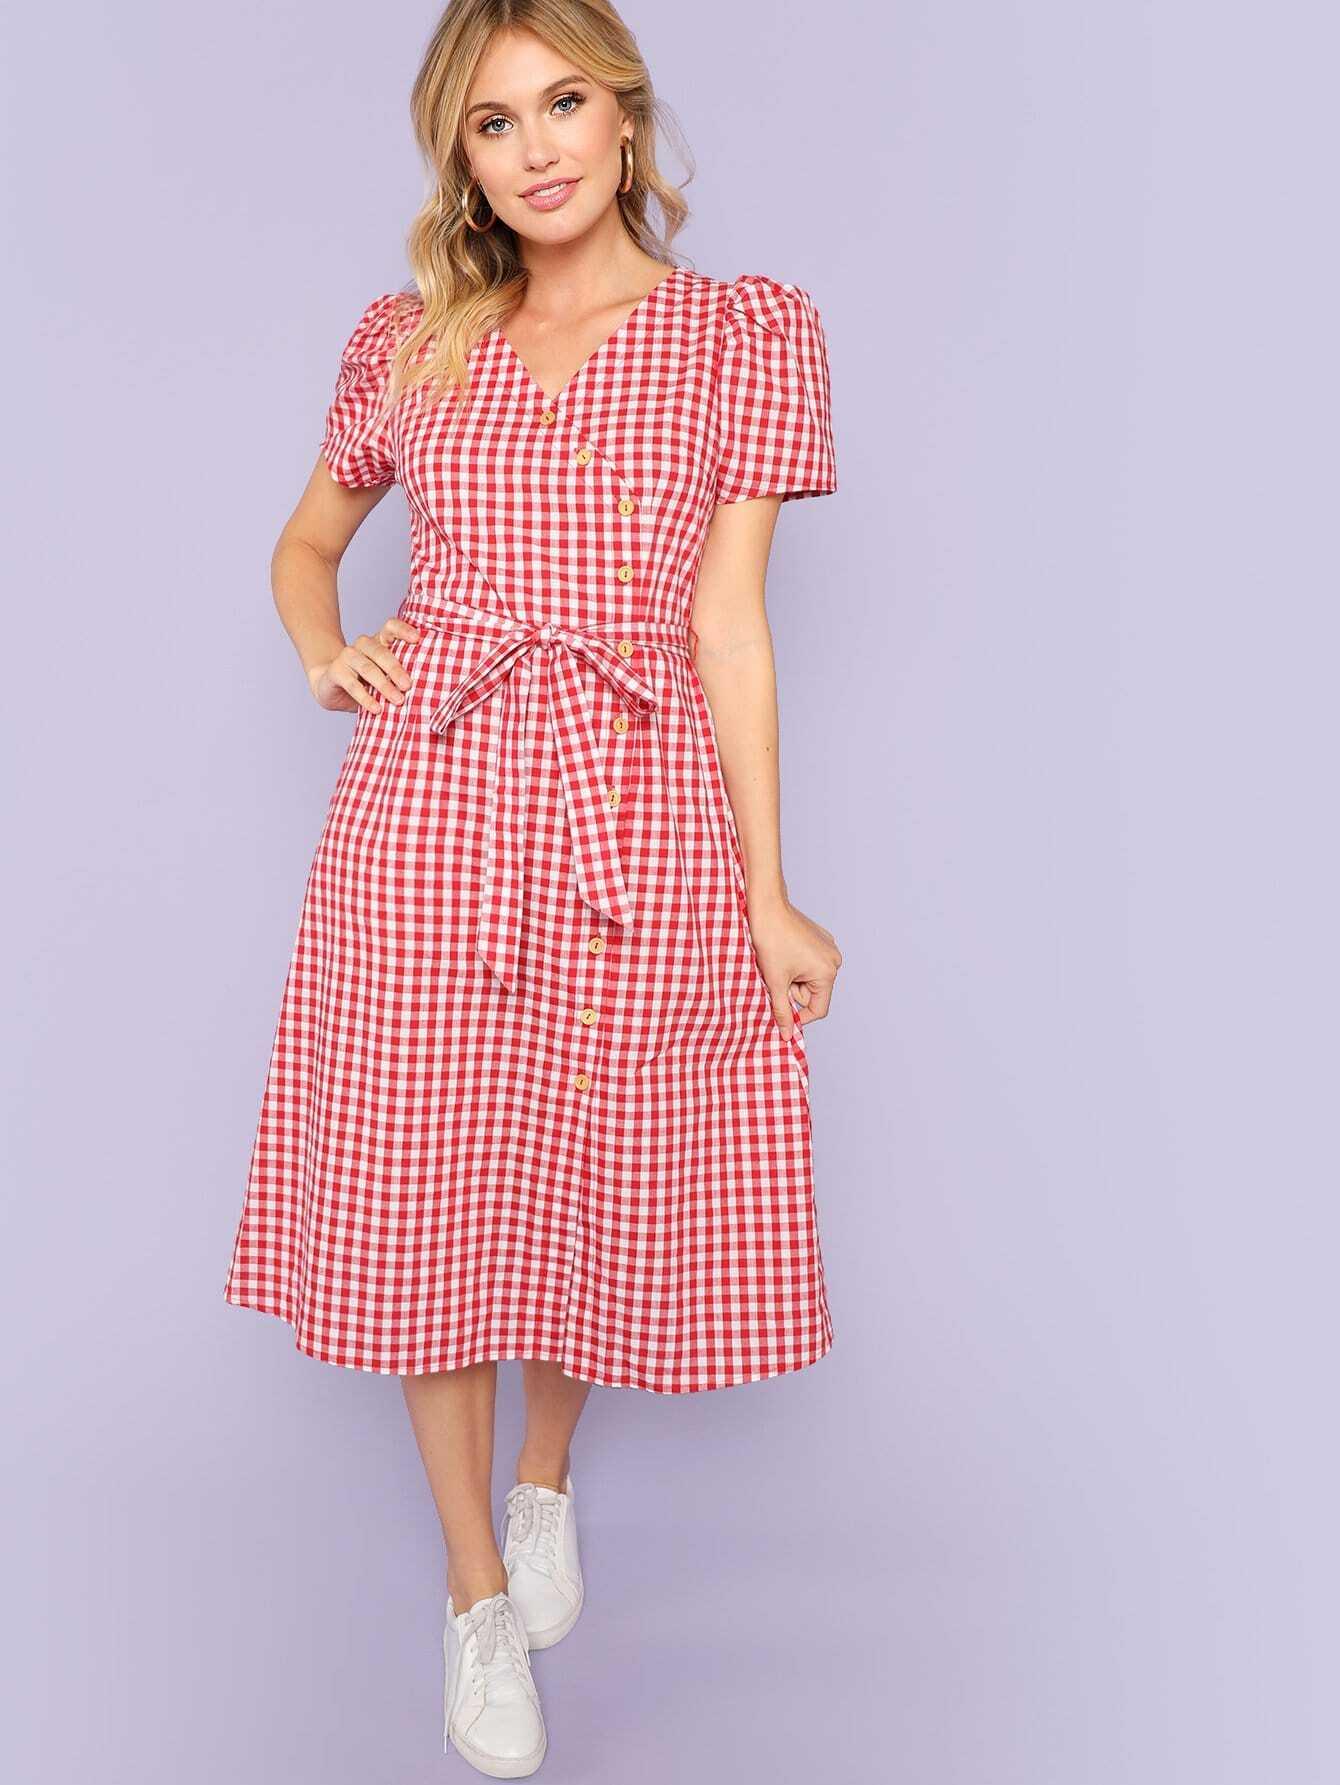 Купить Roll Up рукав кнопки вверх повязкой плед платье, Noelle Brown, SheIn